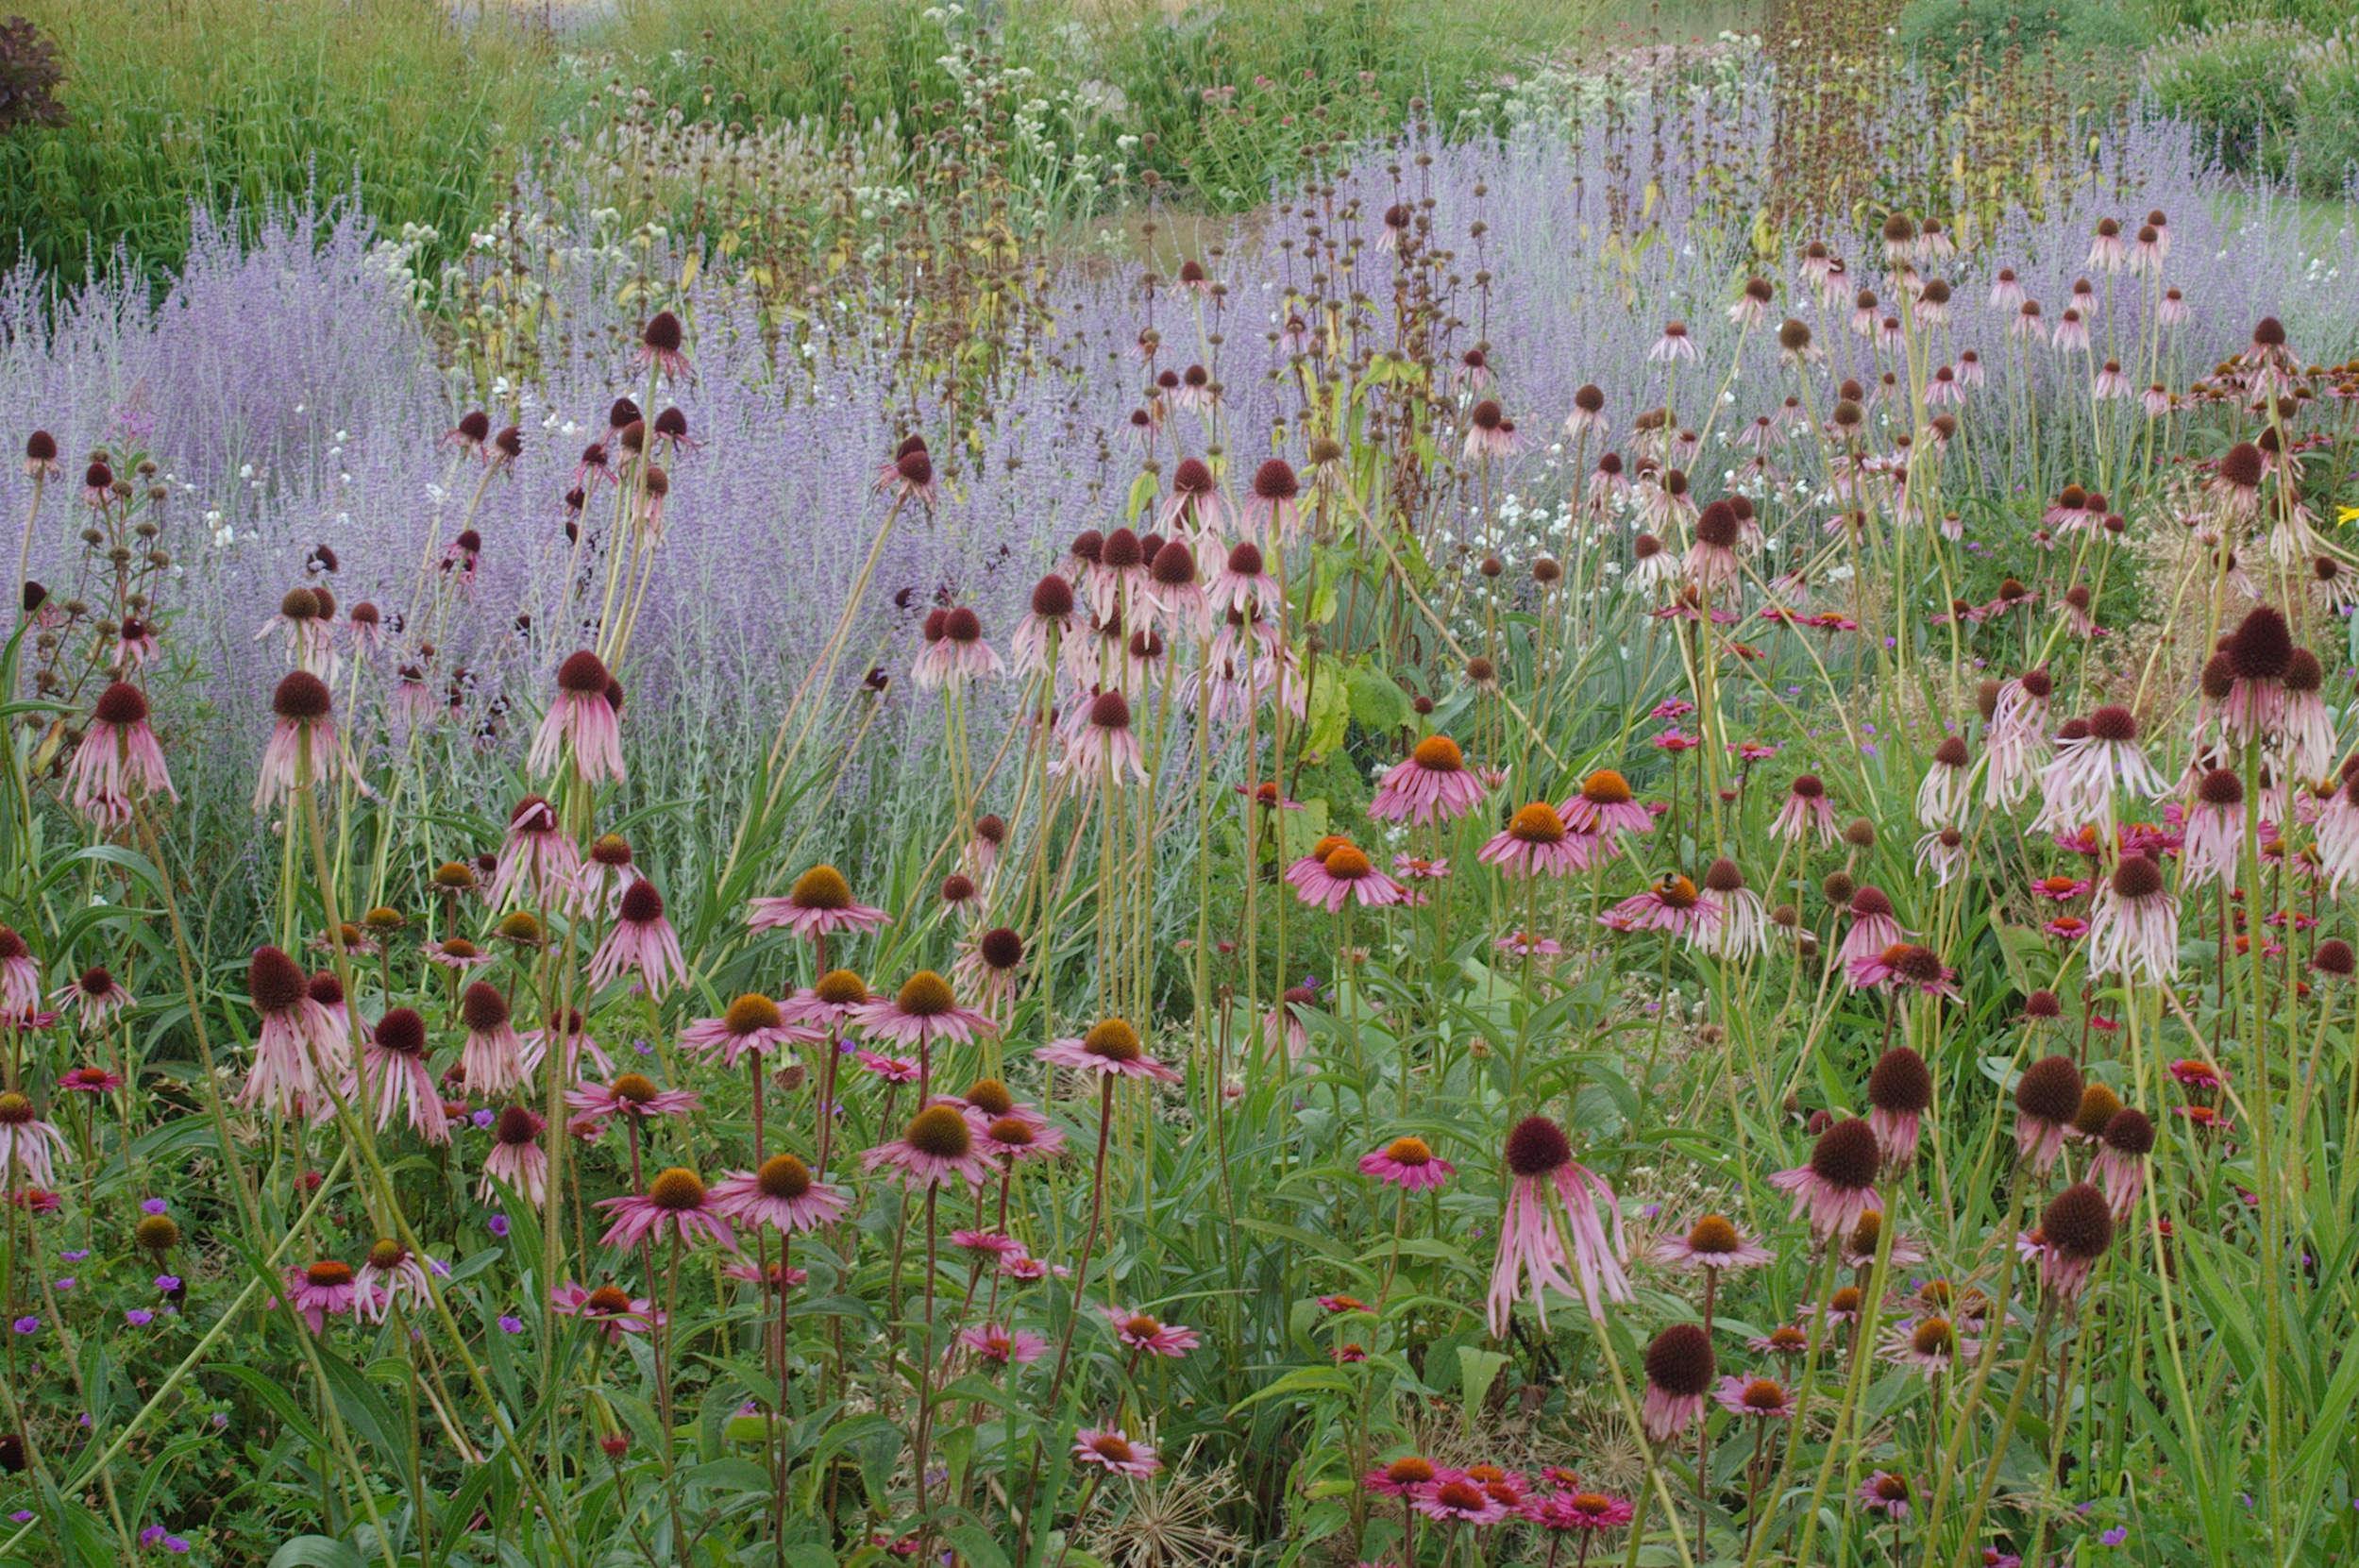 Echinacea varietiesand hazy purple Perovskia atriplicifolia (Russian sage)mingle in Dutch designer Piet Oudolf&#8\2\17;s garden at Hummelo. Photograph courtesy of My Garden School. See more at Garden Design: Learning to Plant the Piet Oudolf Way.